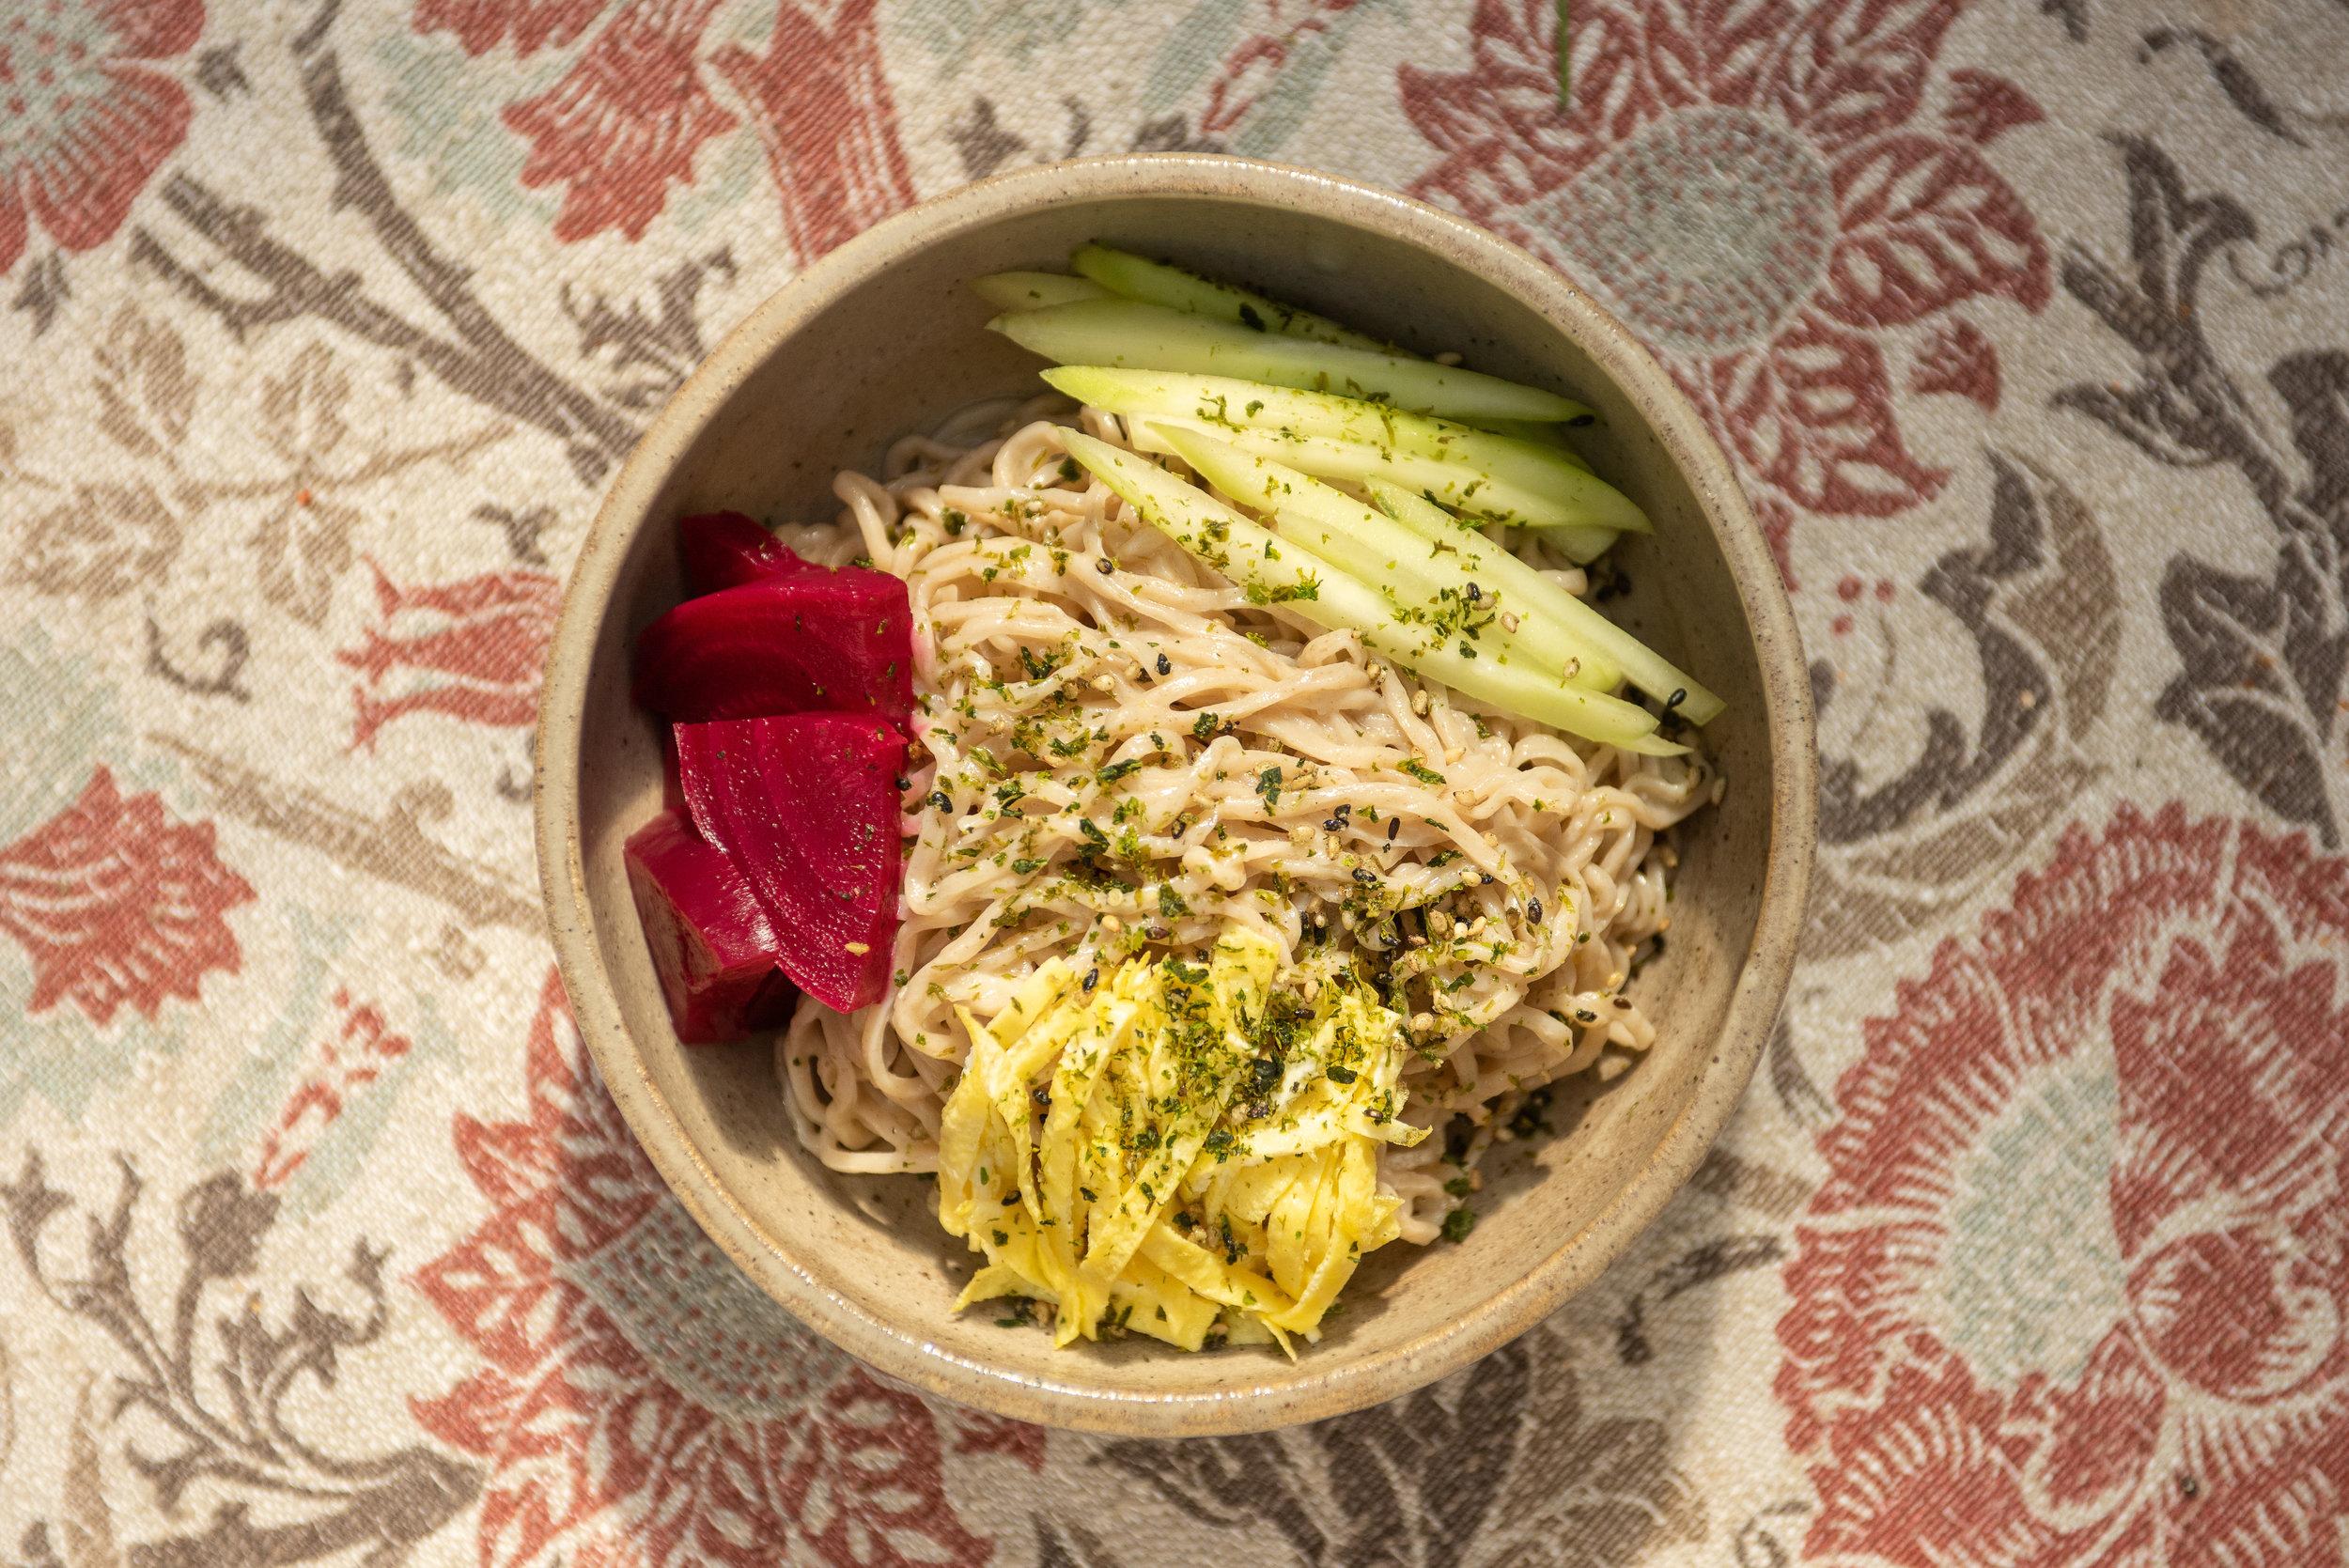 yuris cold sesame noodles-031.jpg